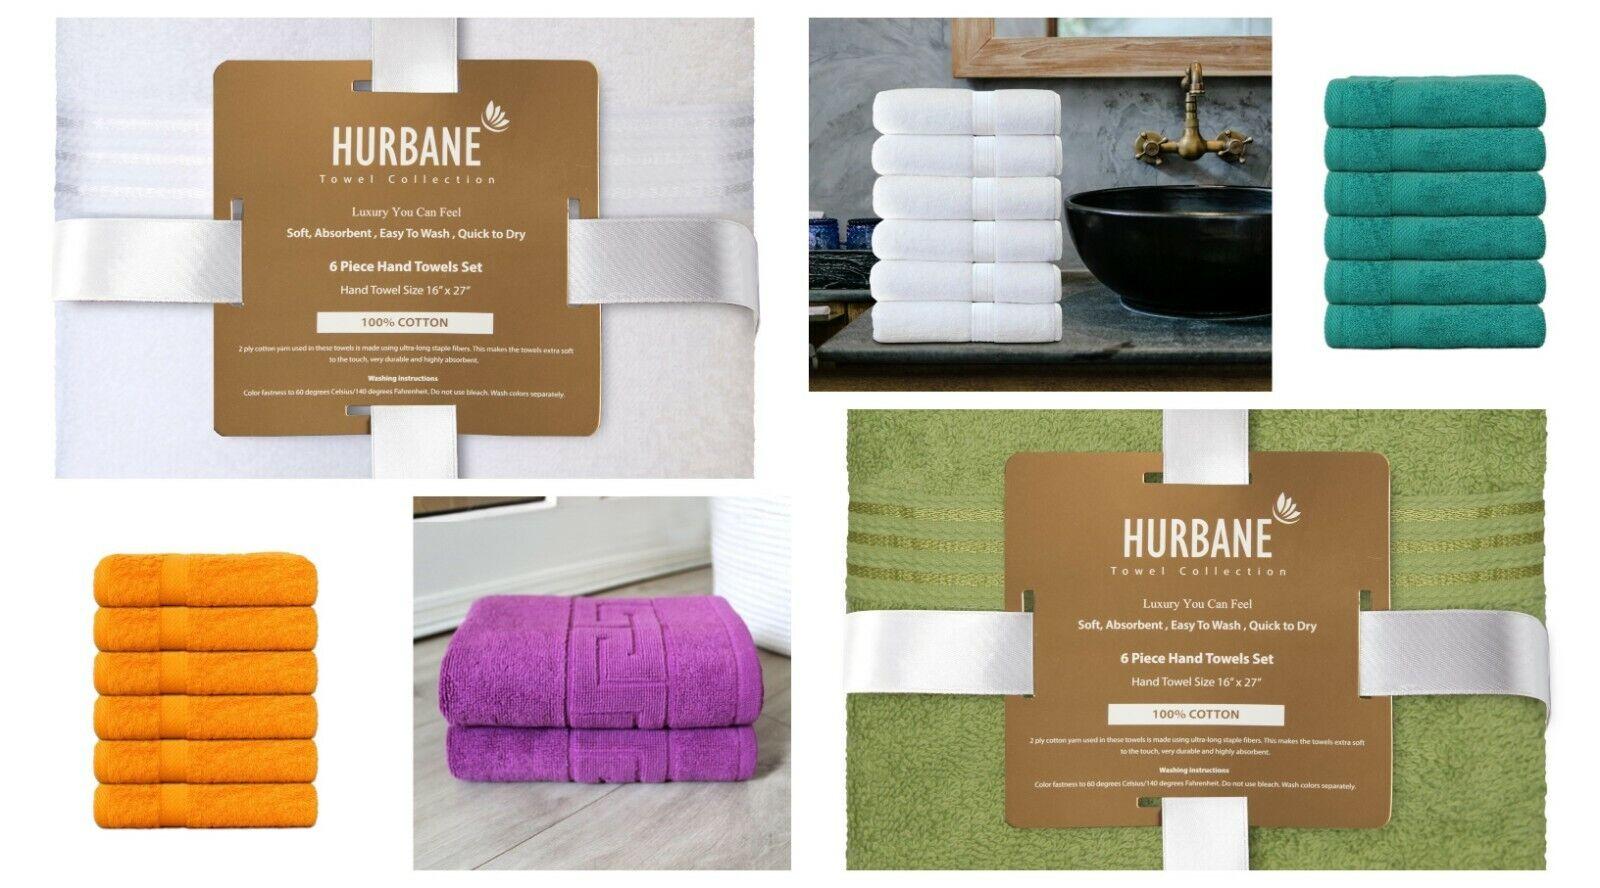 Cotton Hand Towels 16x27 for Bathroom Salon Gym Spa Quick Dry 550gsm HQ Towel US